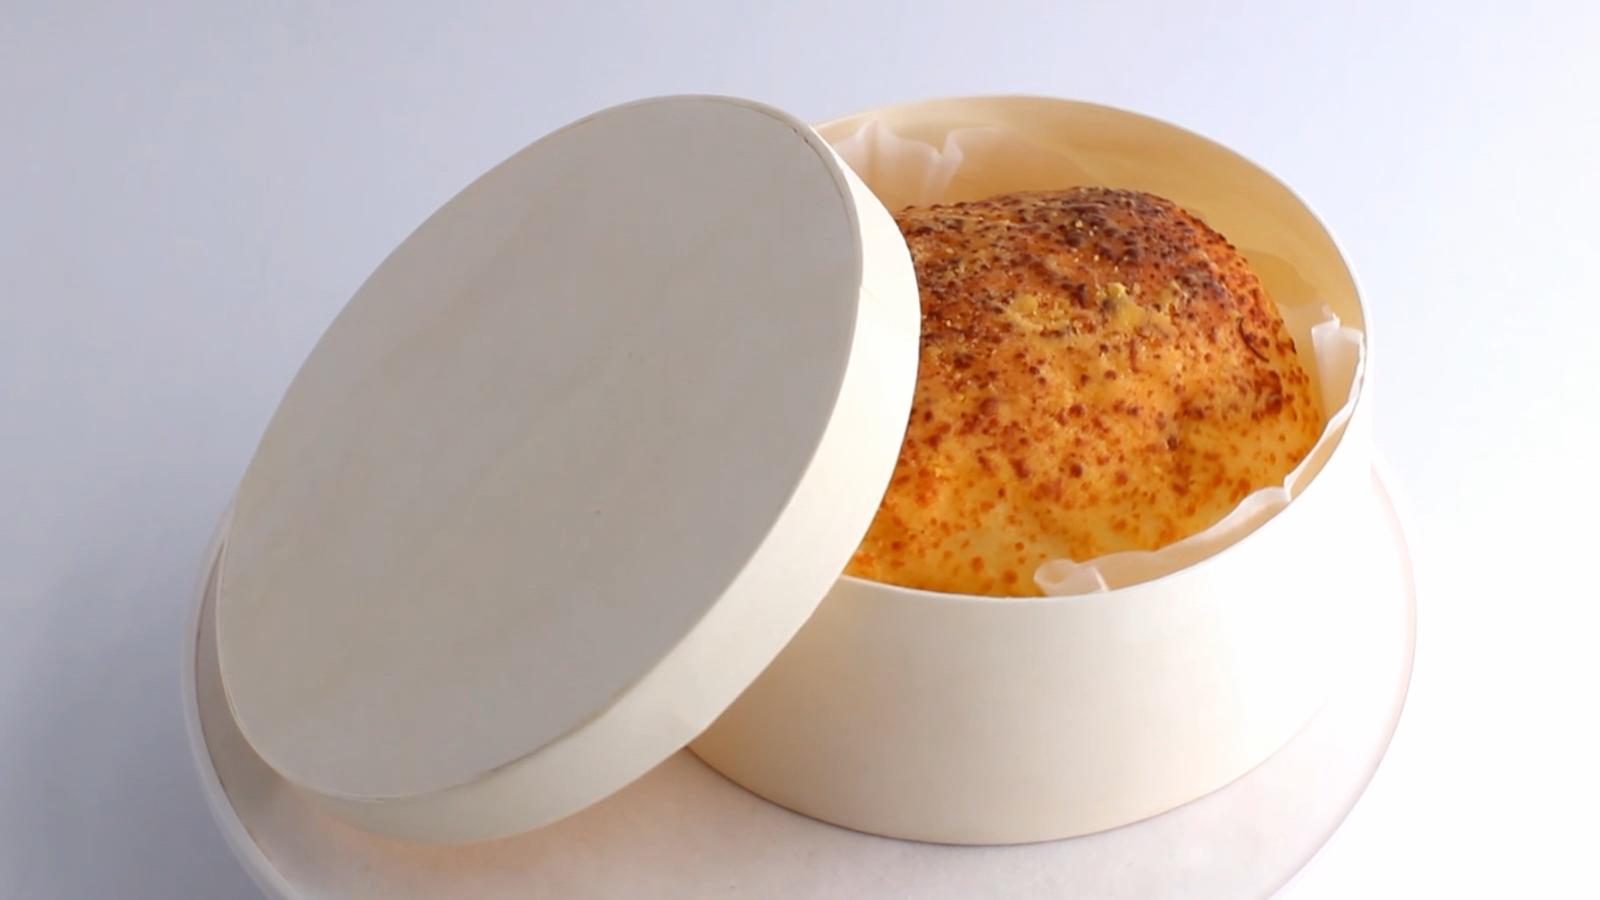 Biyobozunur ahşap paket servisi olan restoran yiyecek kutusu yuvarlak kek kaplama kutusu ahşap peynir kutusu